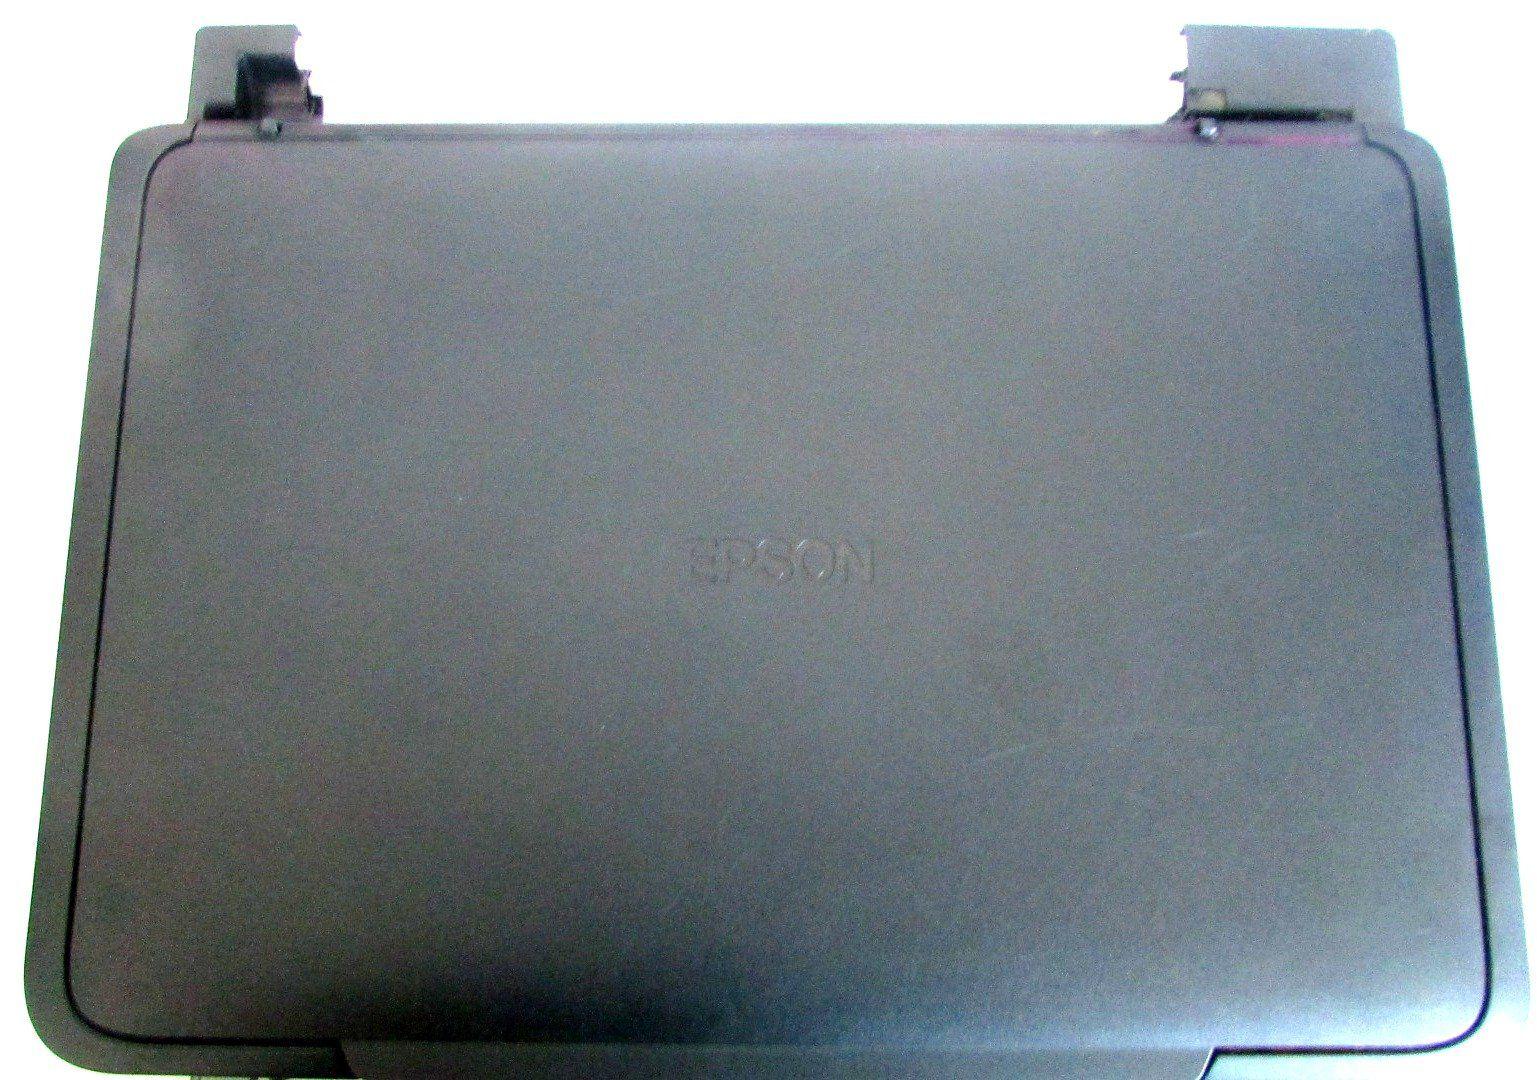 Scanner Completo P/ Impressoras Epson  Xp-214 (semi  novo)